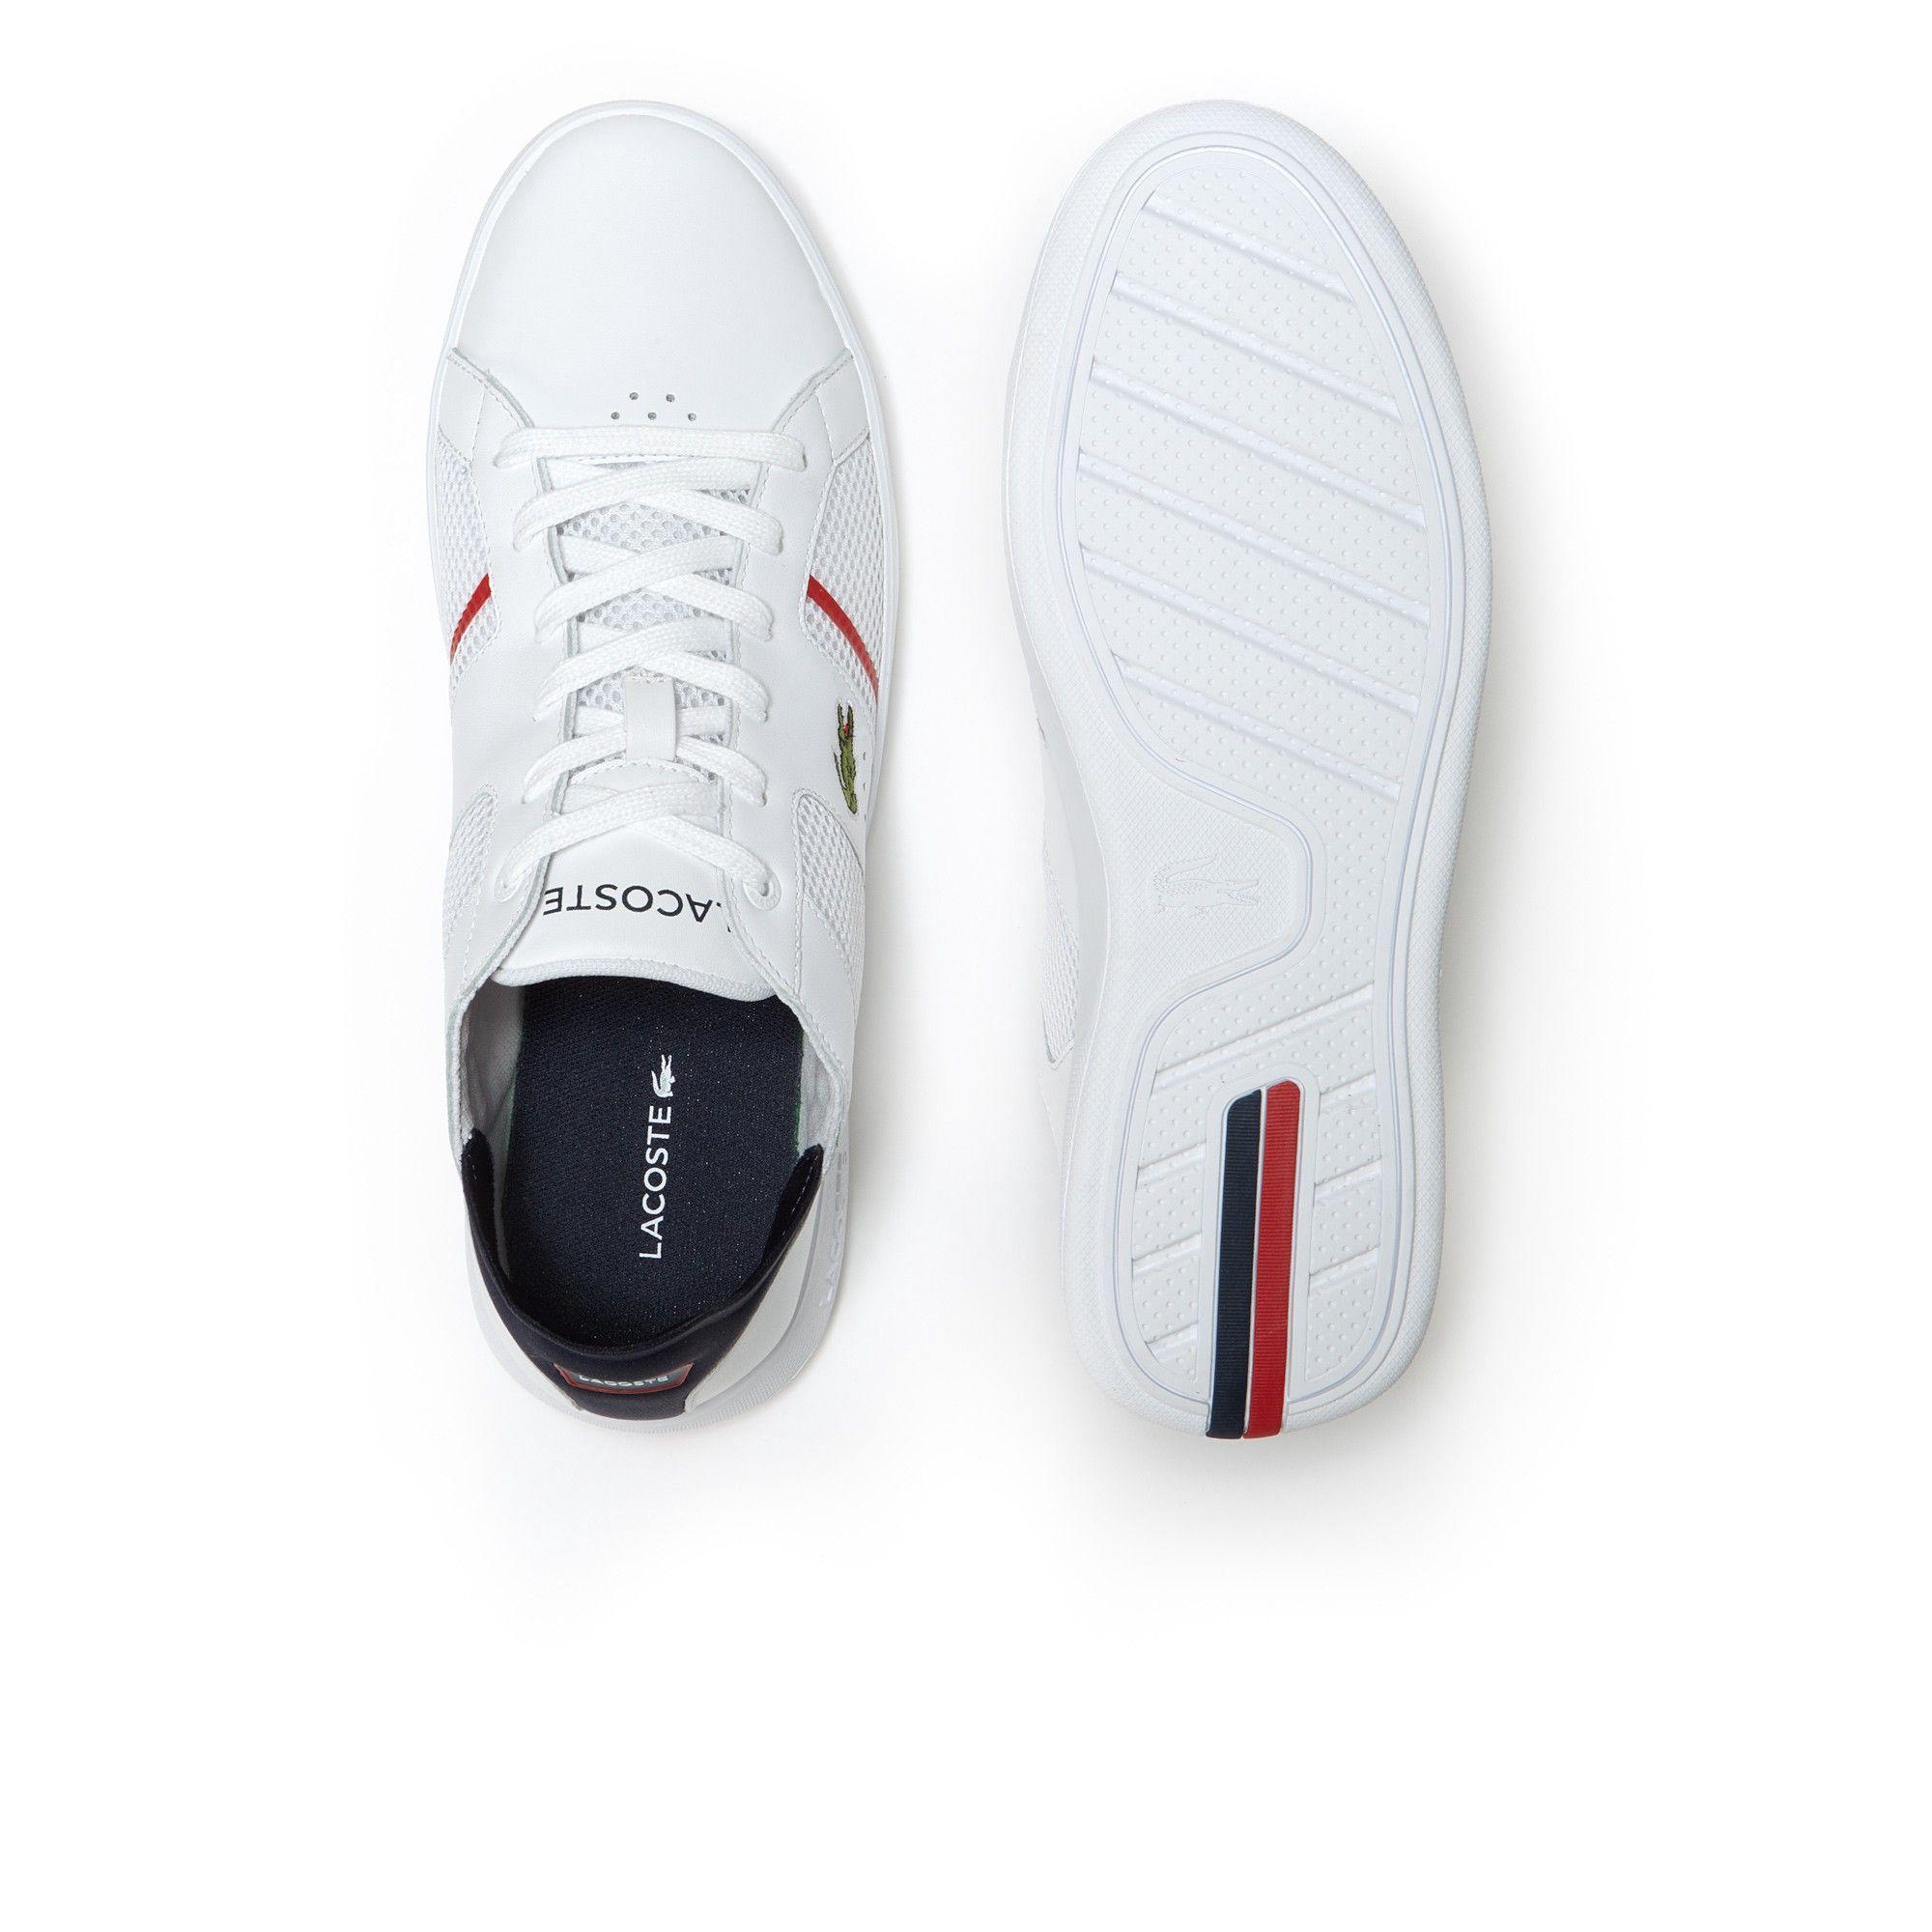 373fb65c4 Lacoste Men s Novas Ct Leather Trainers - White   Navy 10.5 ...